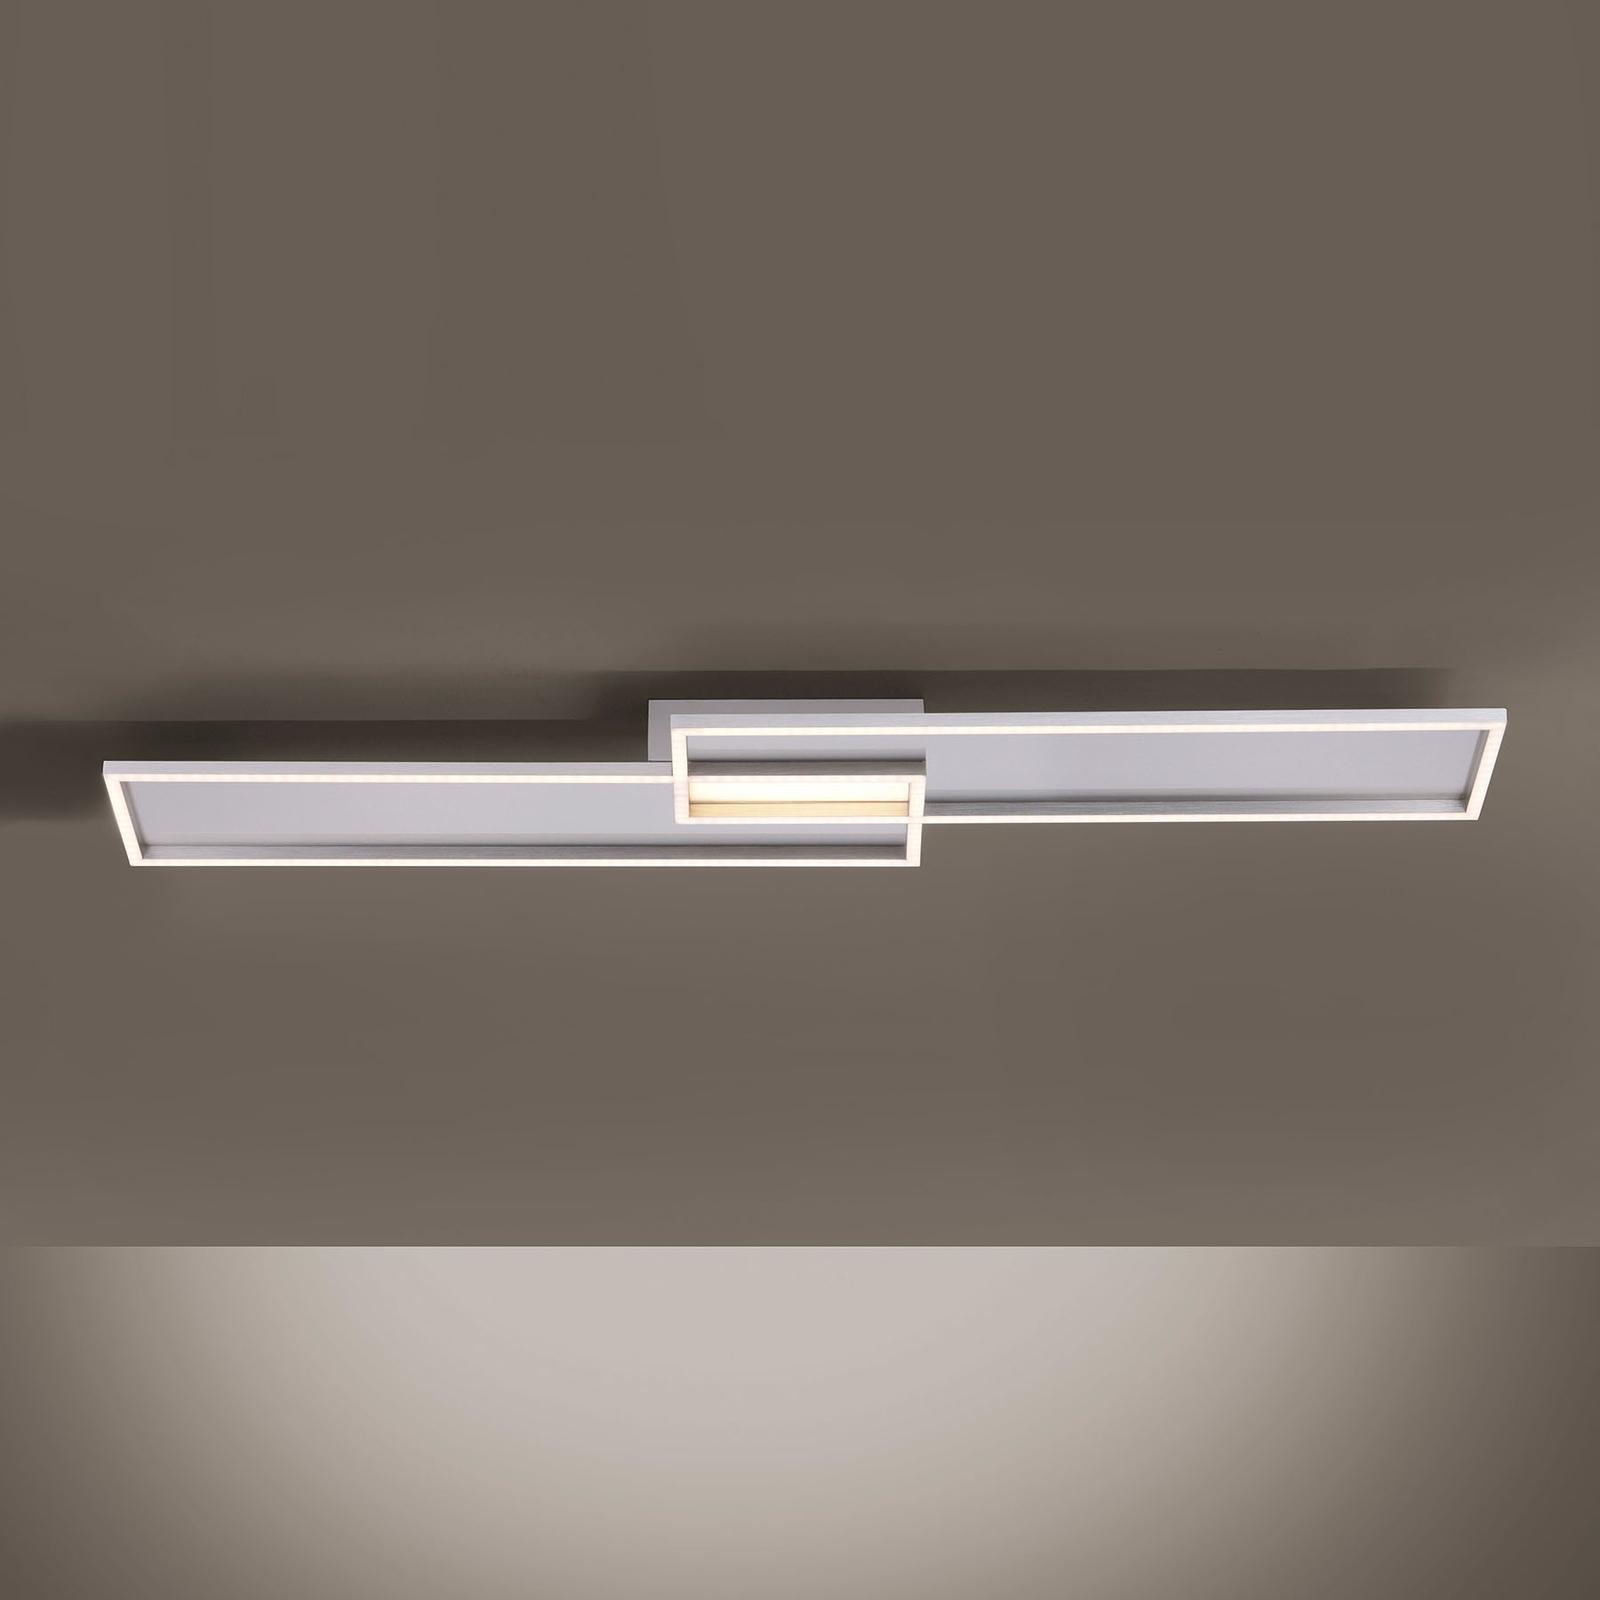 LED-kattovalaisin Amara, kaksi suorakulmiota hopea